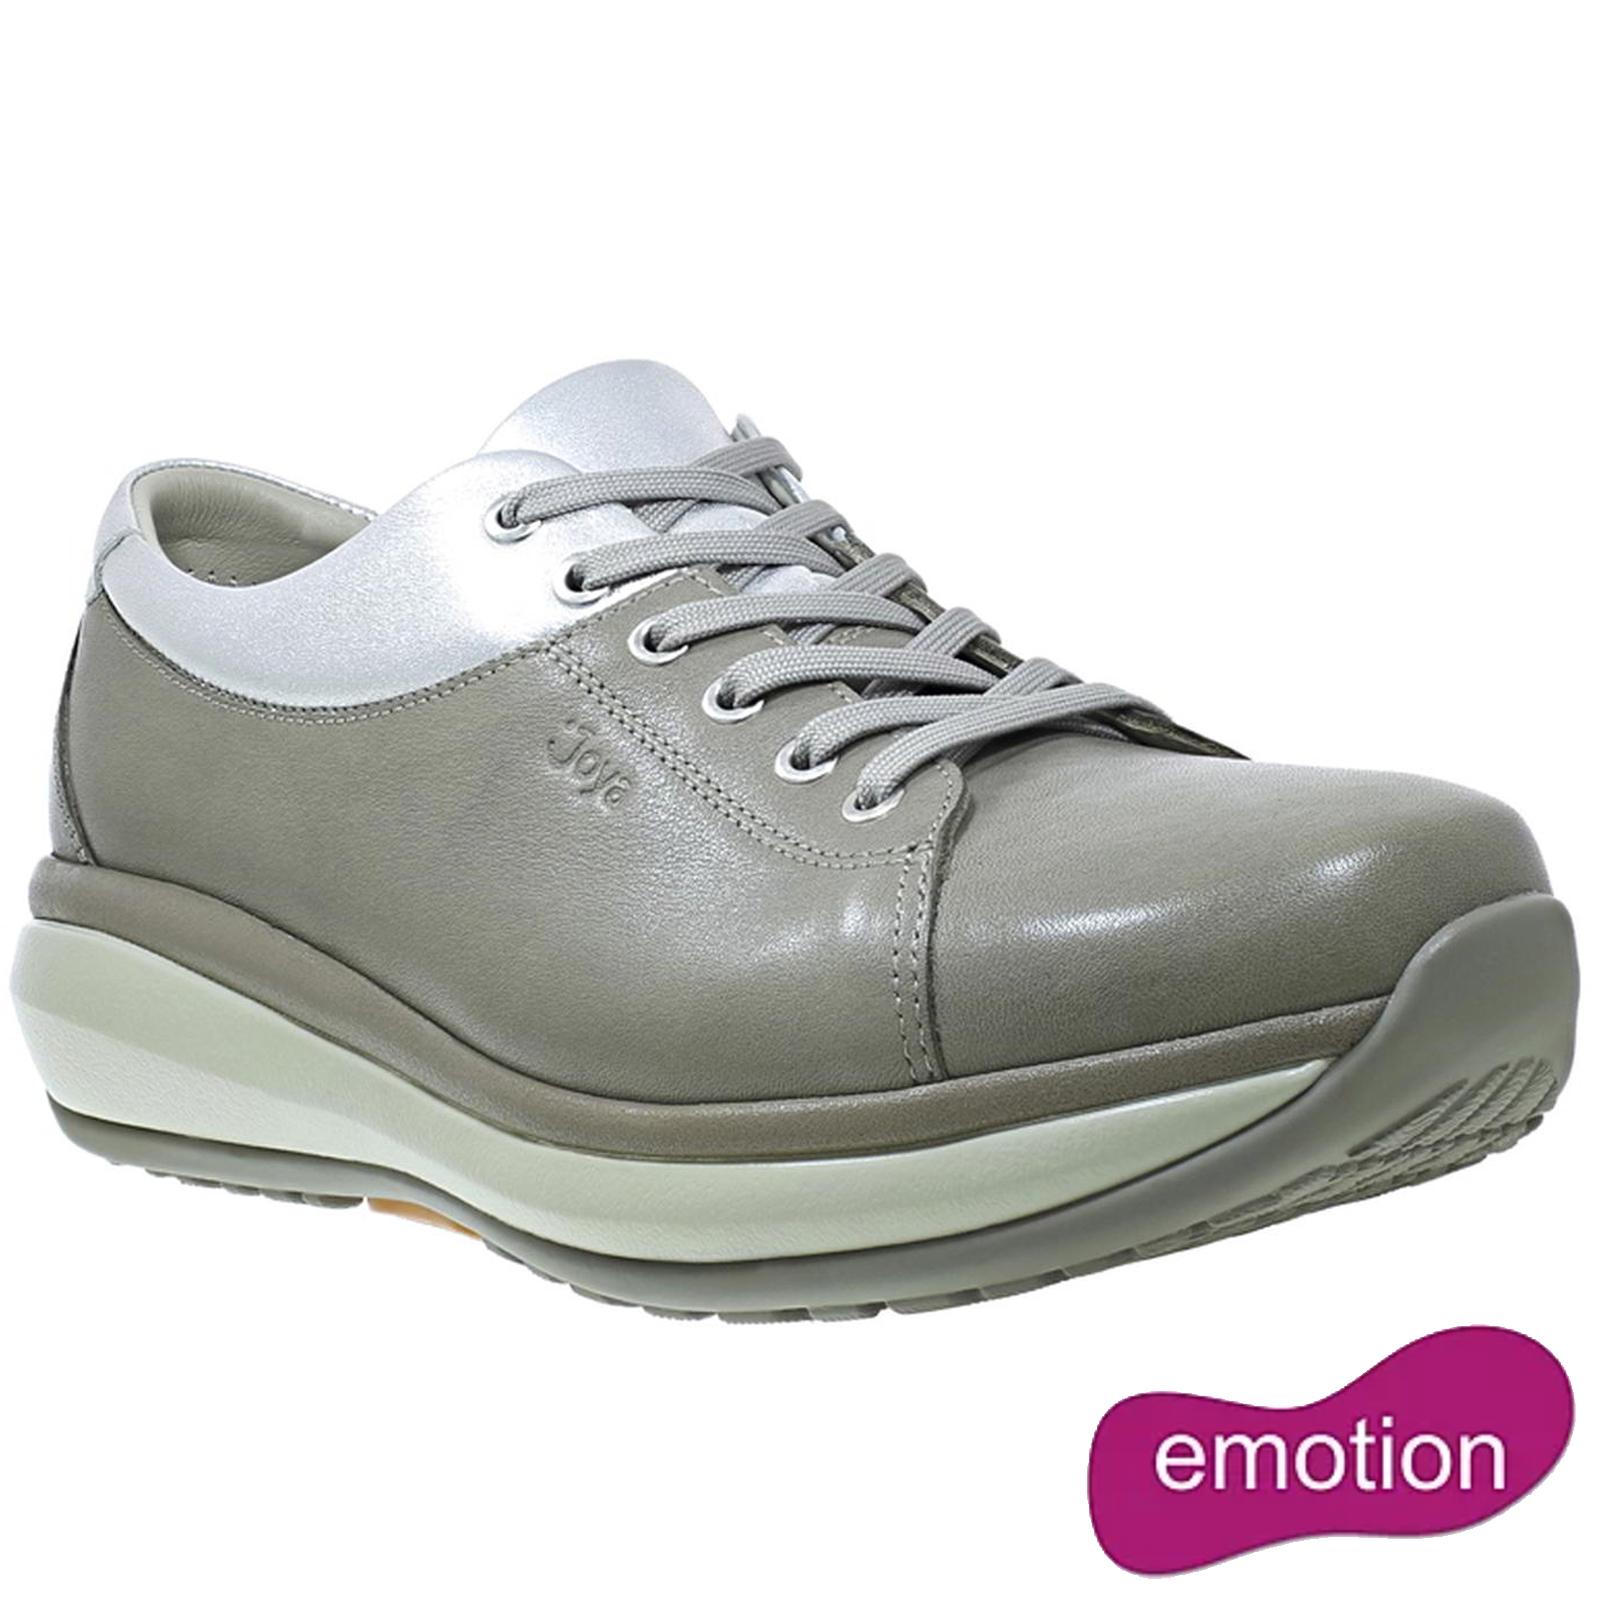 Joya Womens Athena Leather Shoes - Moonrock